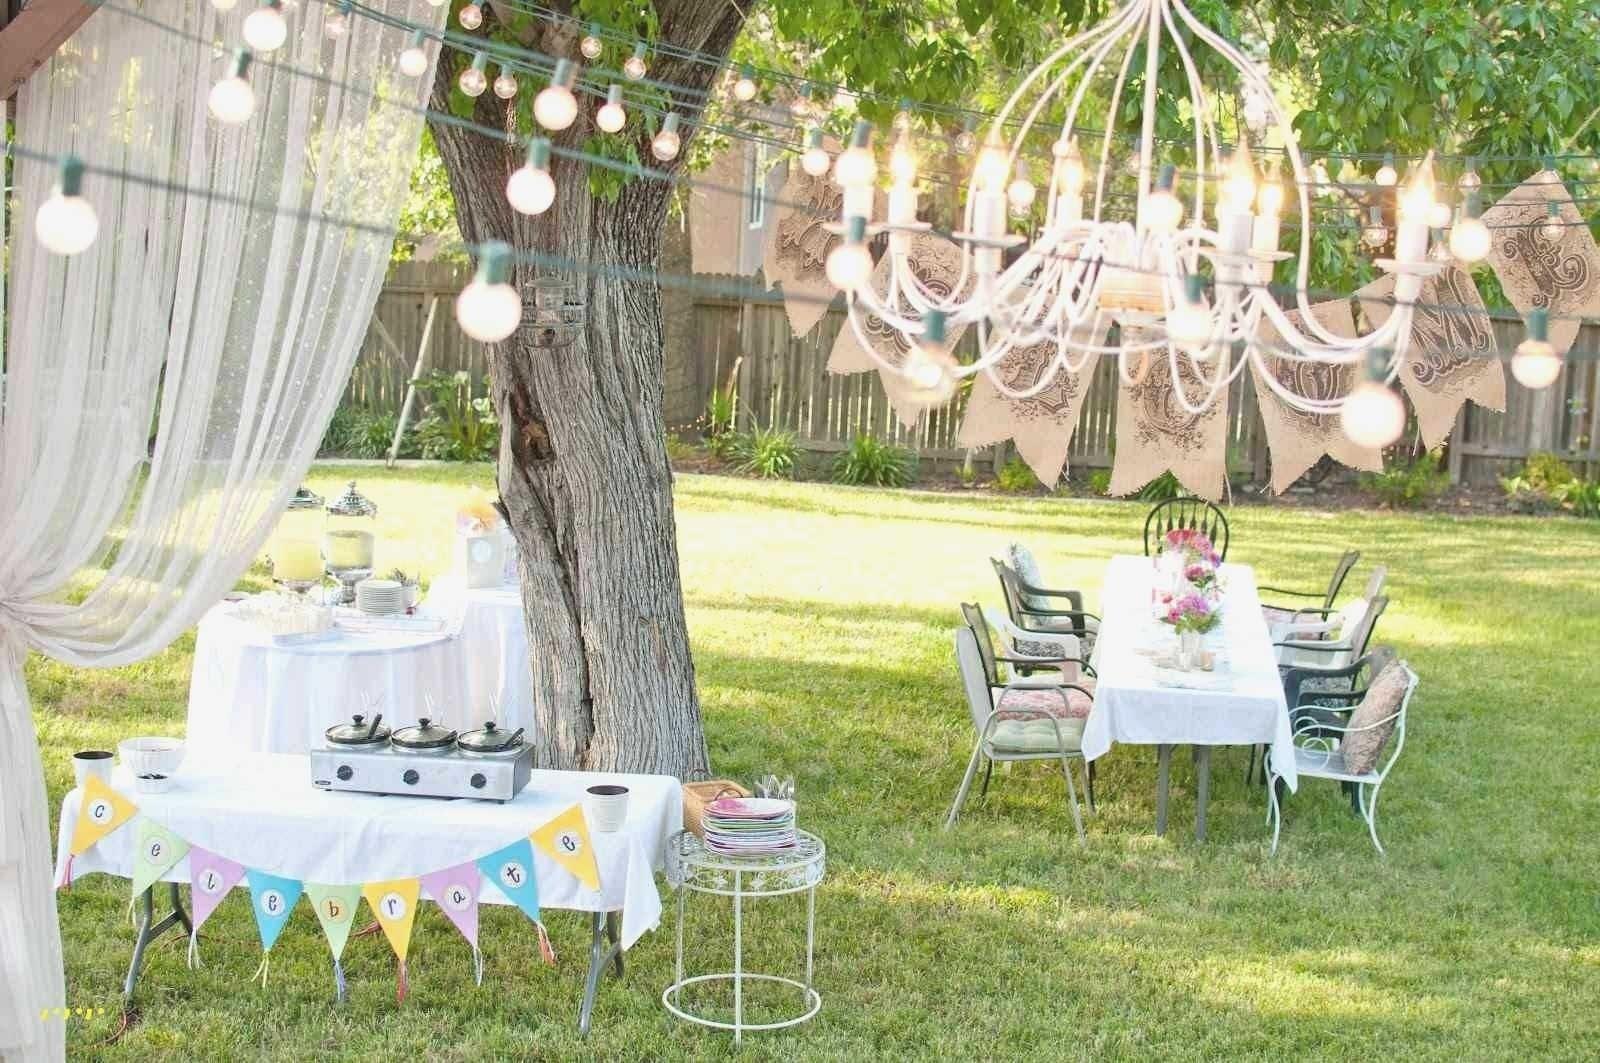 10 Stylish Backyard Birthday Party Ideas For Adults backyard birthday decoration ideas awesome birthday party ideas